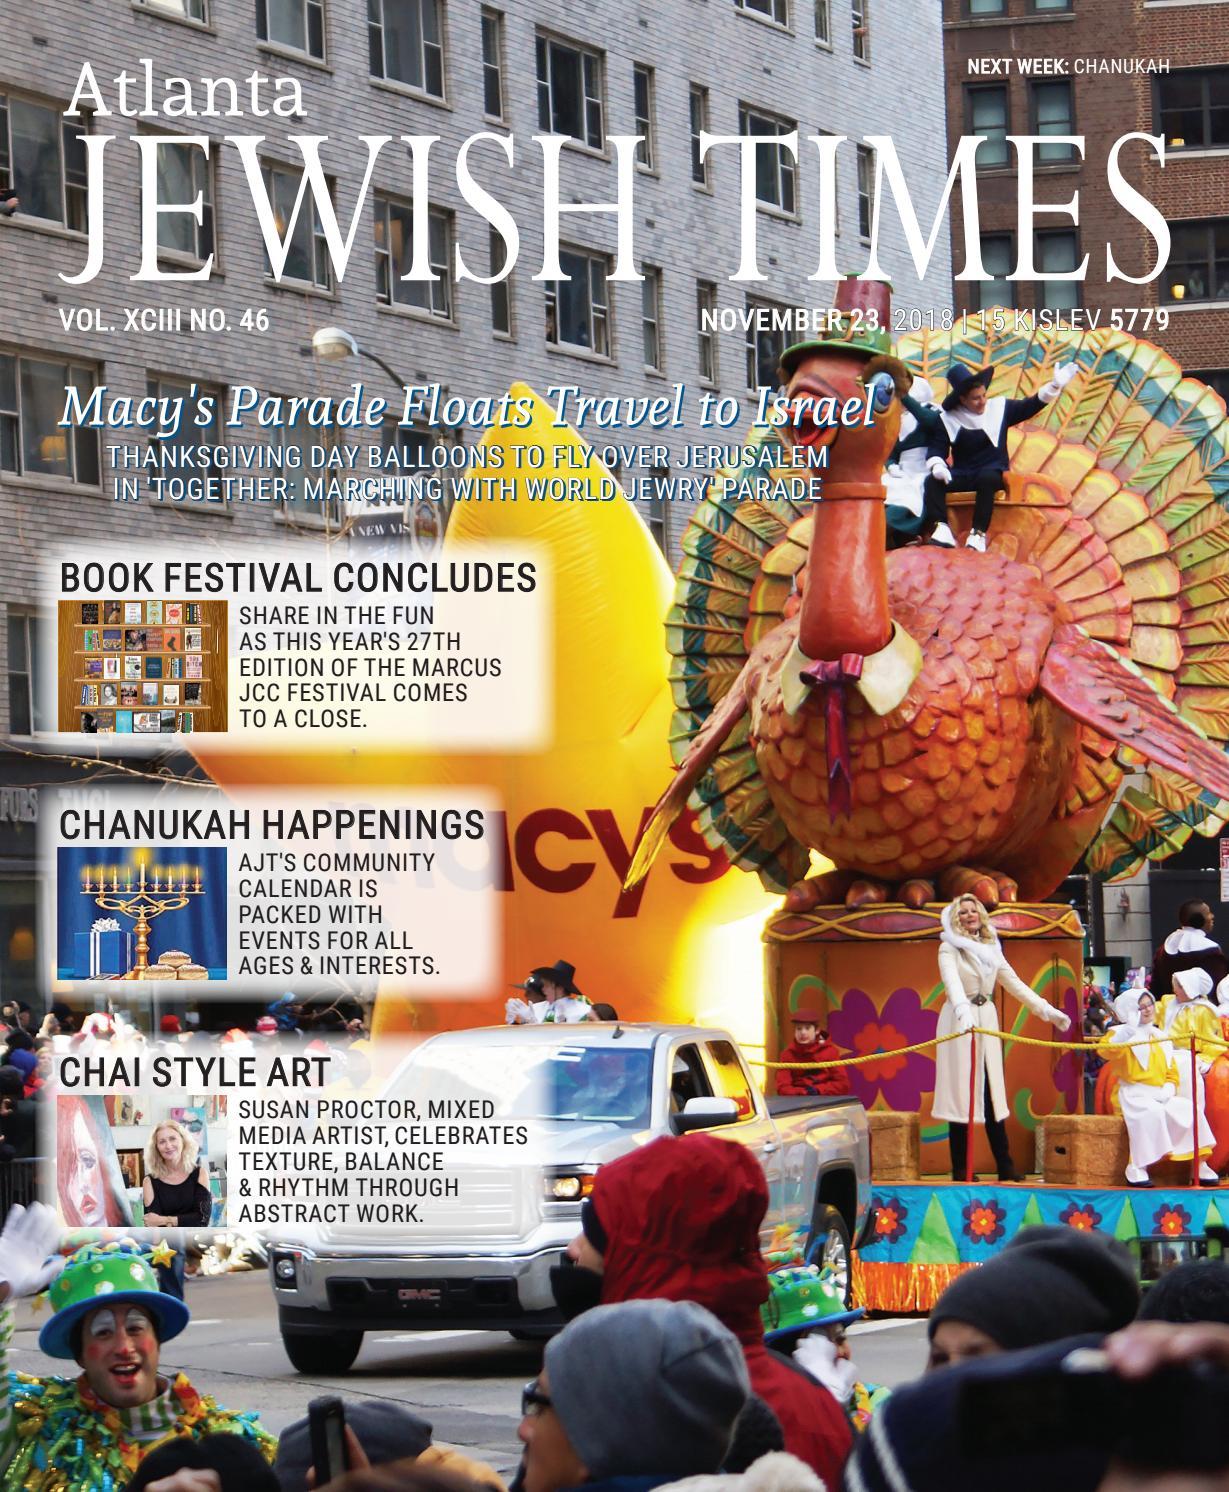 Atlanta Jewish Times Vol Xciii No 46 November 23 2018 By 15 Conductive Marker Create A Magical Circuit Board Christmas Village Issuu